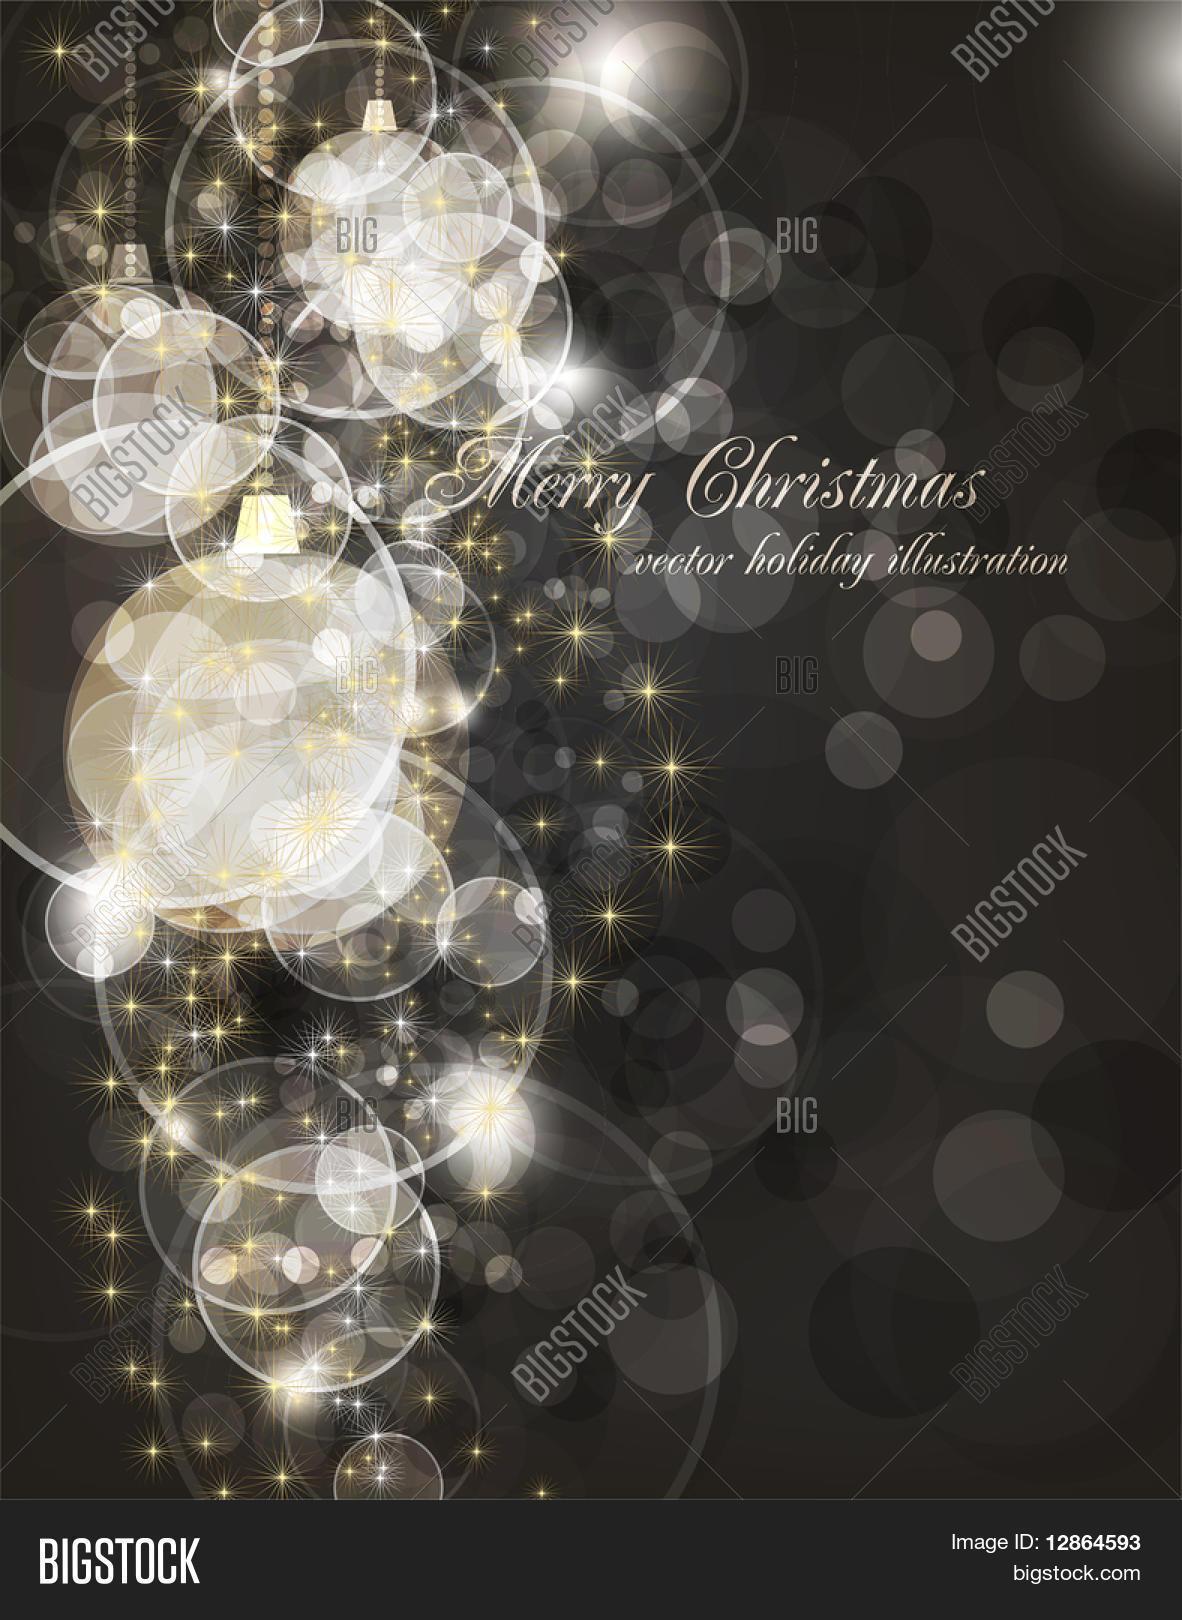 Christmas Invitation Background Gold.Elegant Christmas Vector Photo Free Trial Bigstock